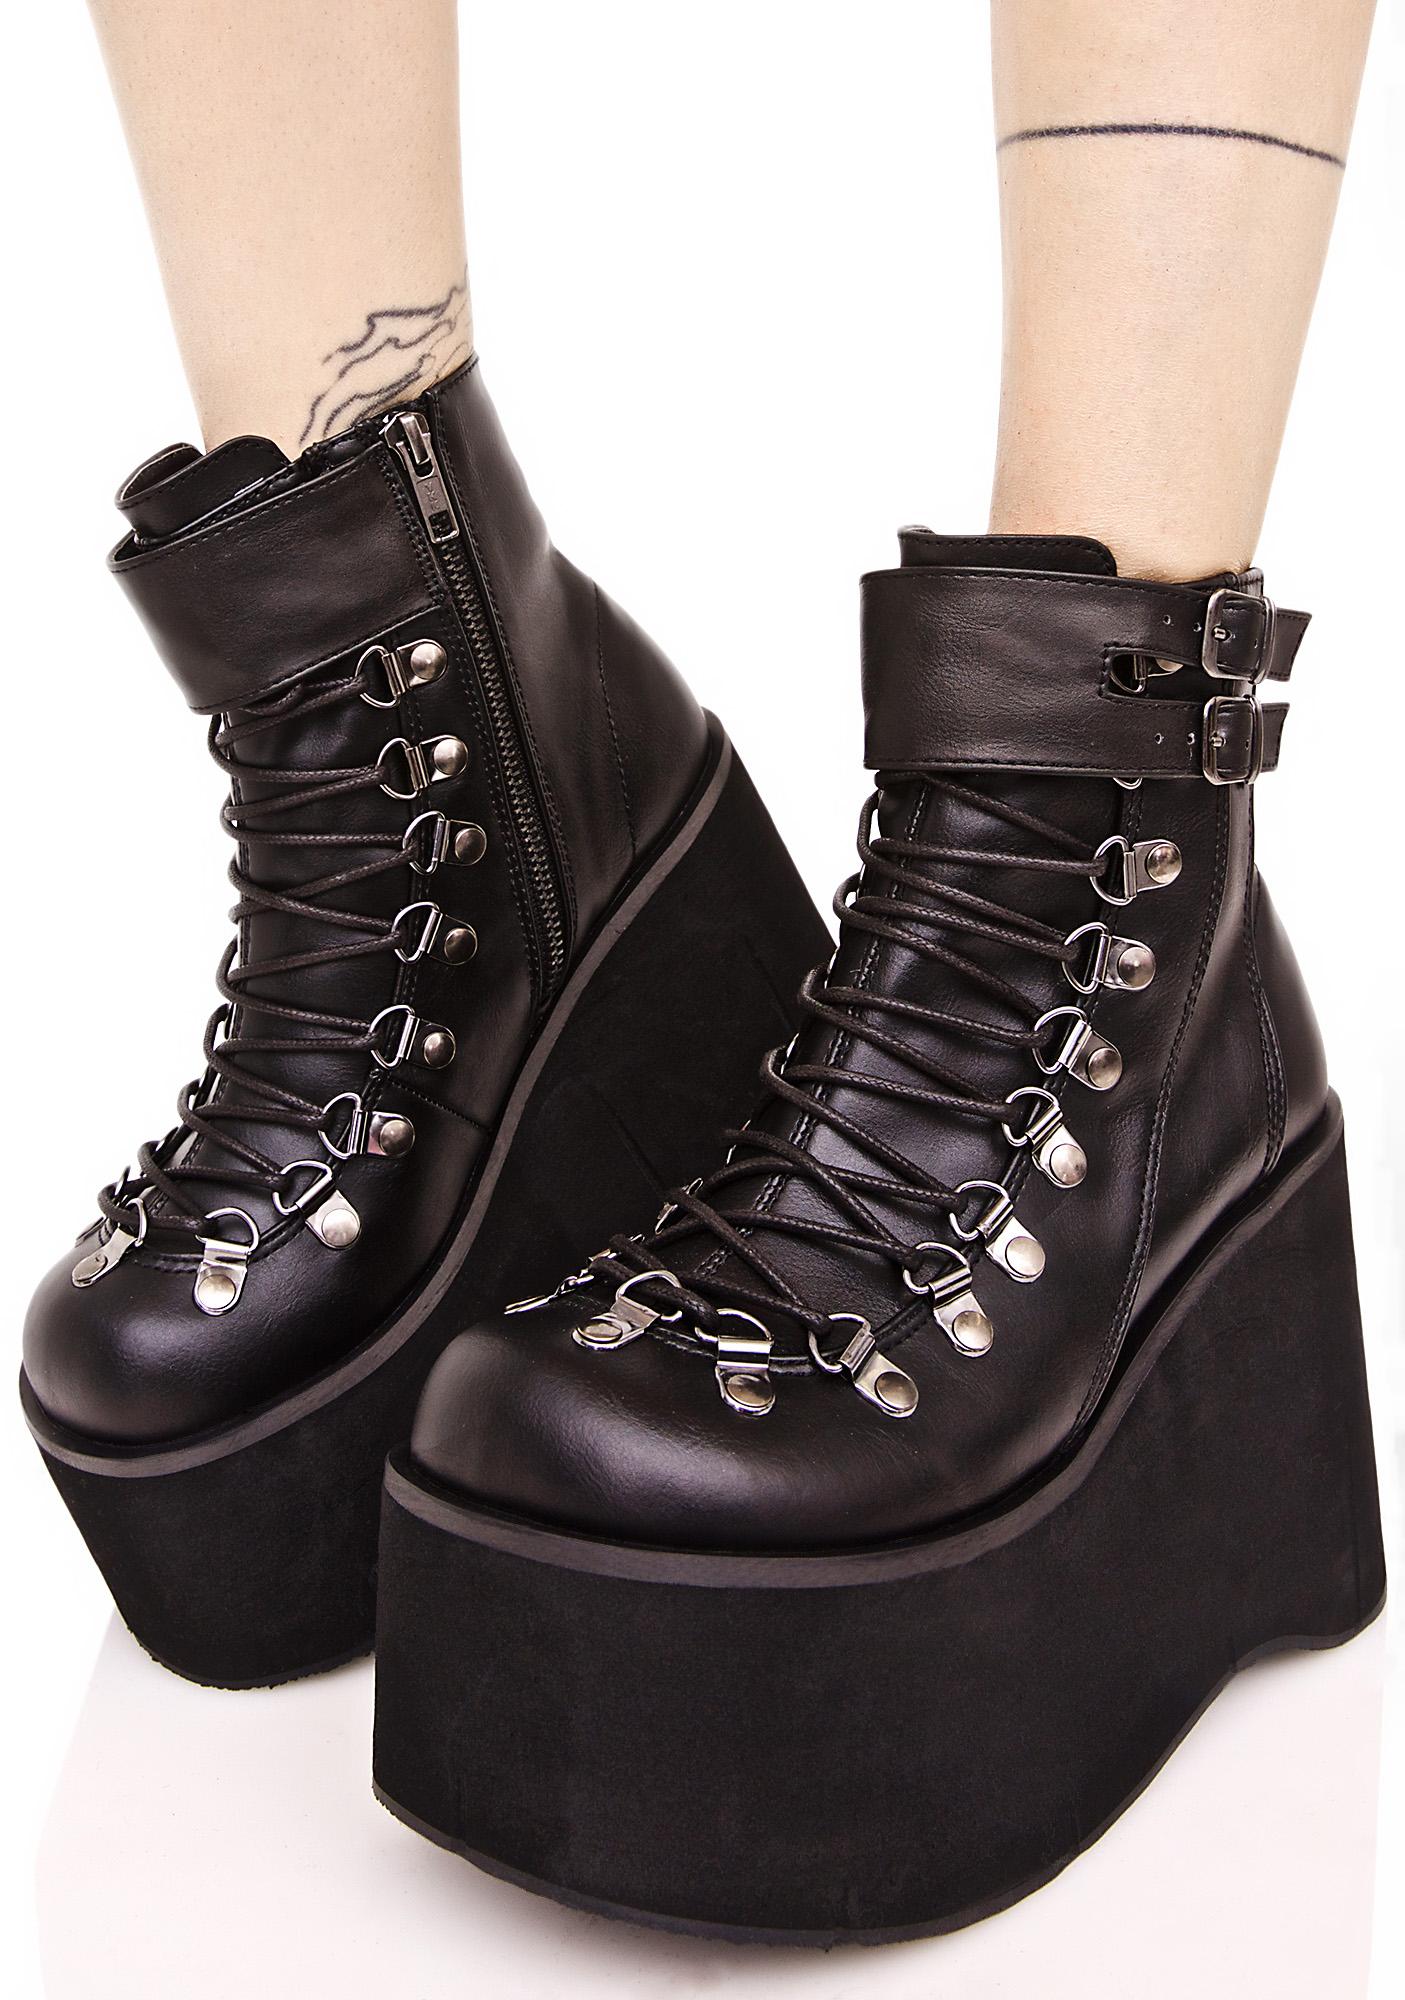 Demonia Kera Lace-Up Platform Boots